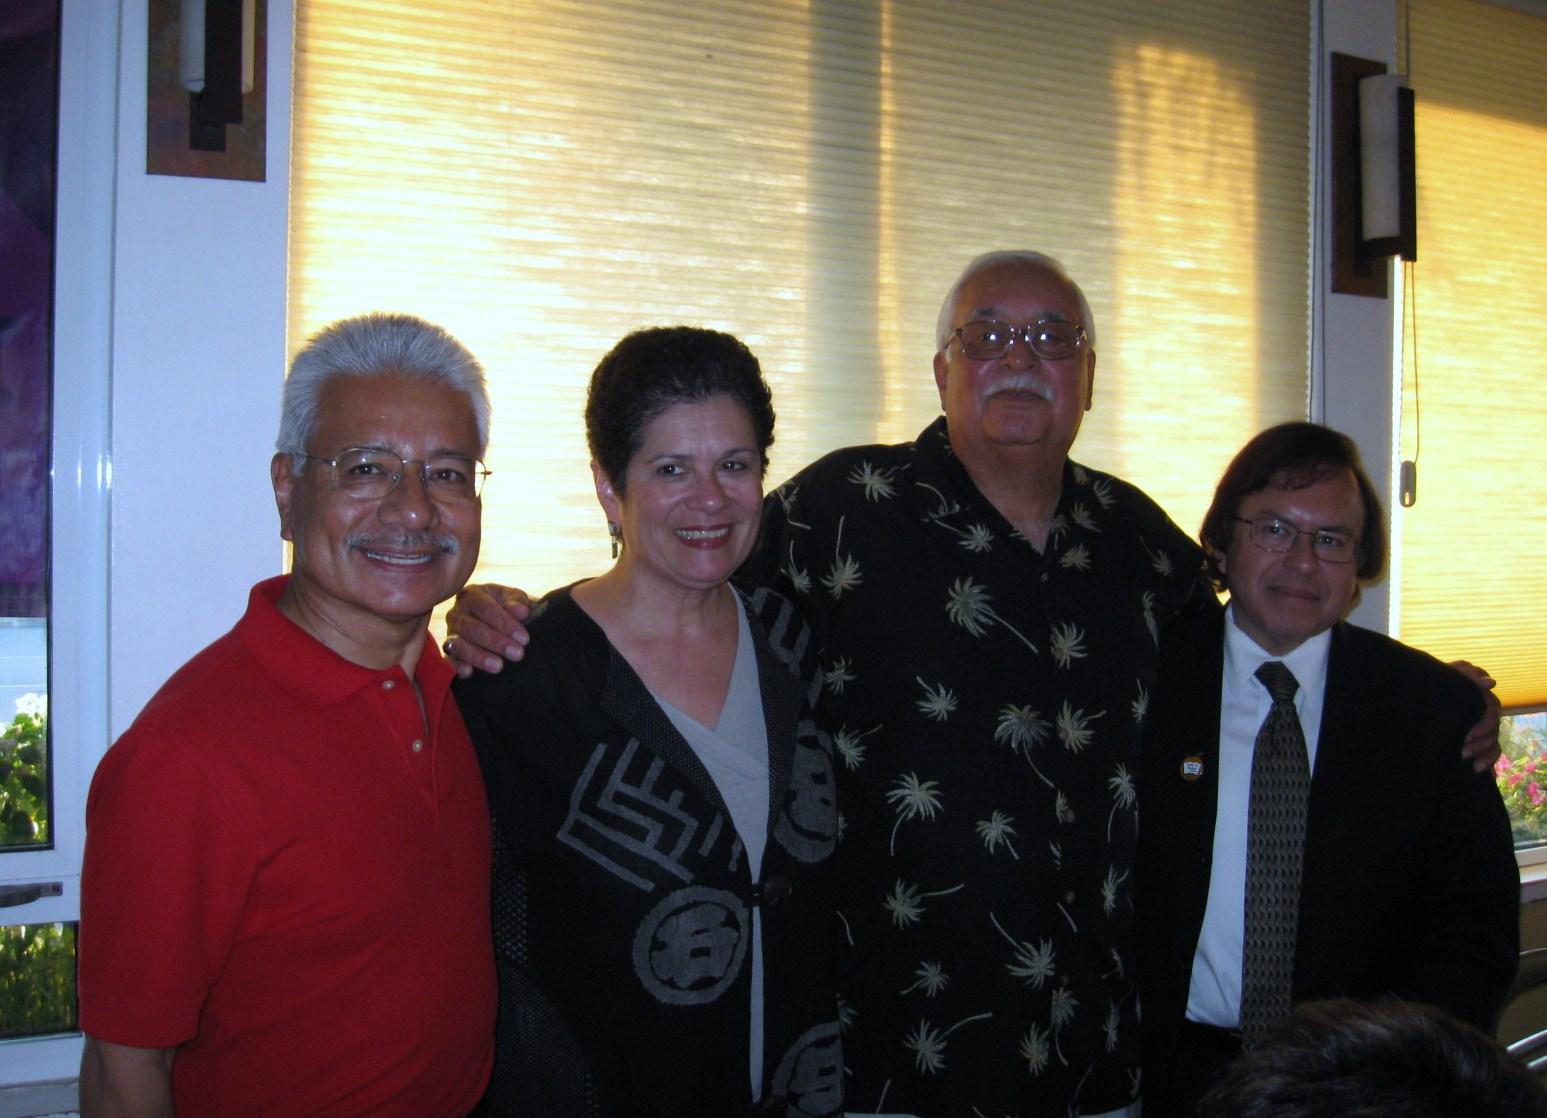 Al Milo, Susan Luevano (2009 Winner), John Ayala, Ron Rodriguez (2008 Winner)